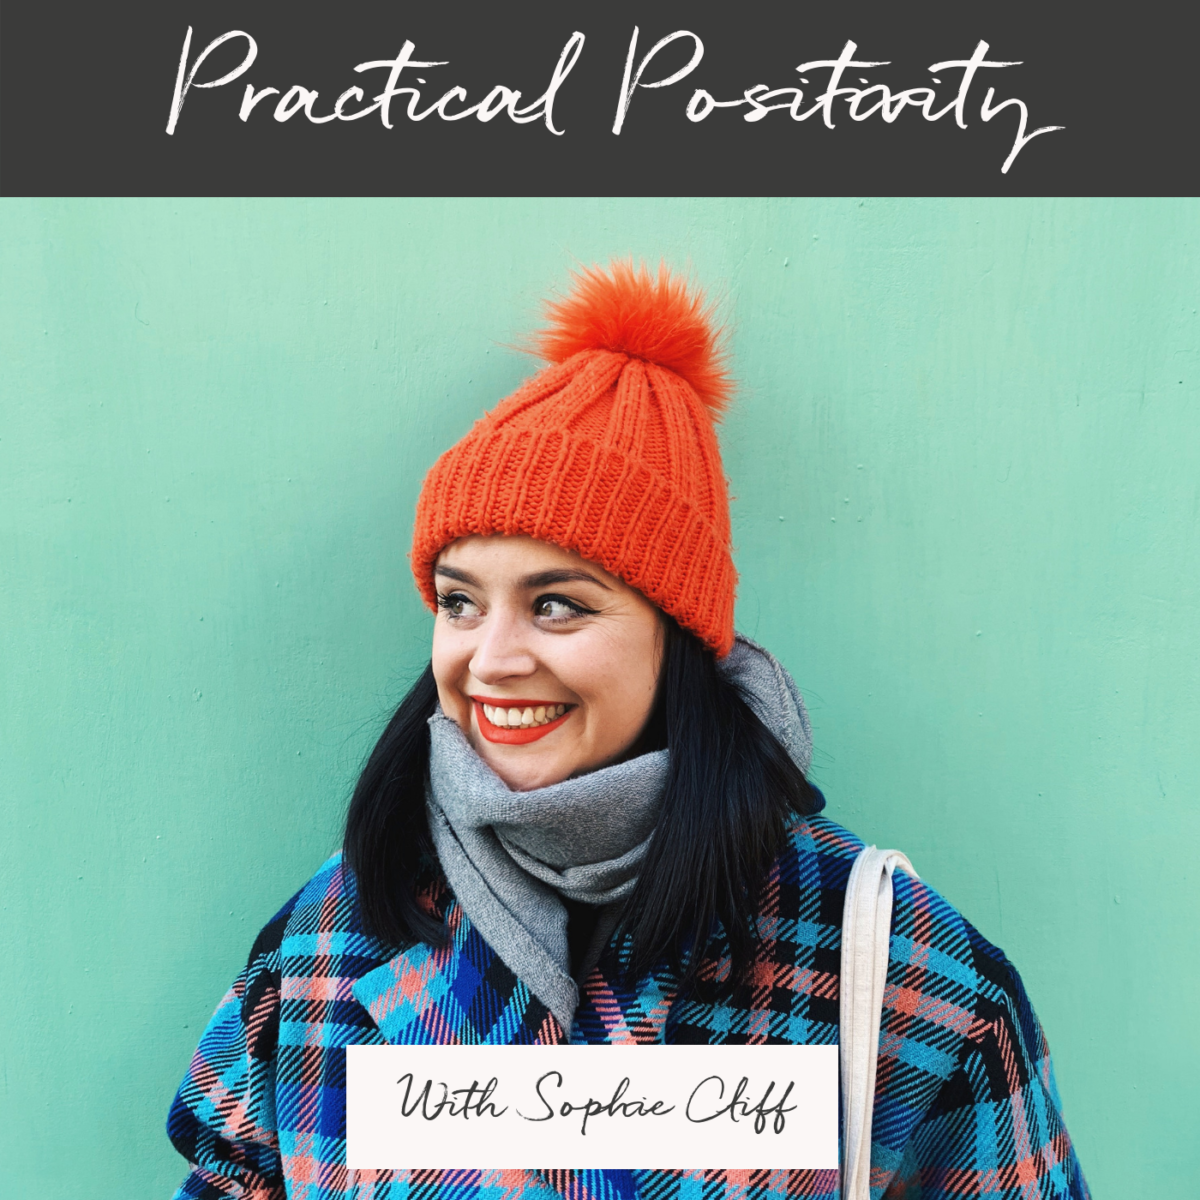 Practical Positivity podcast